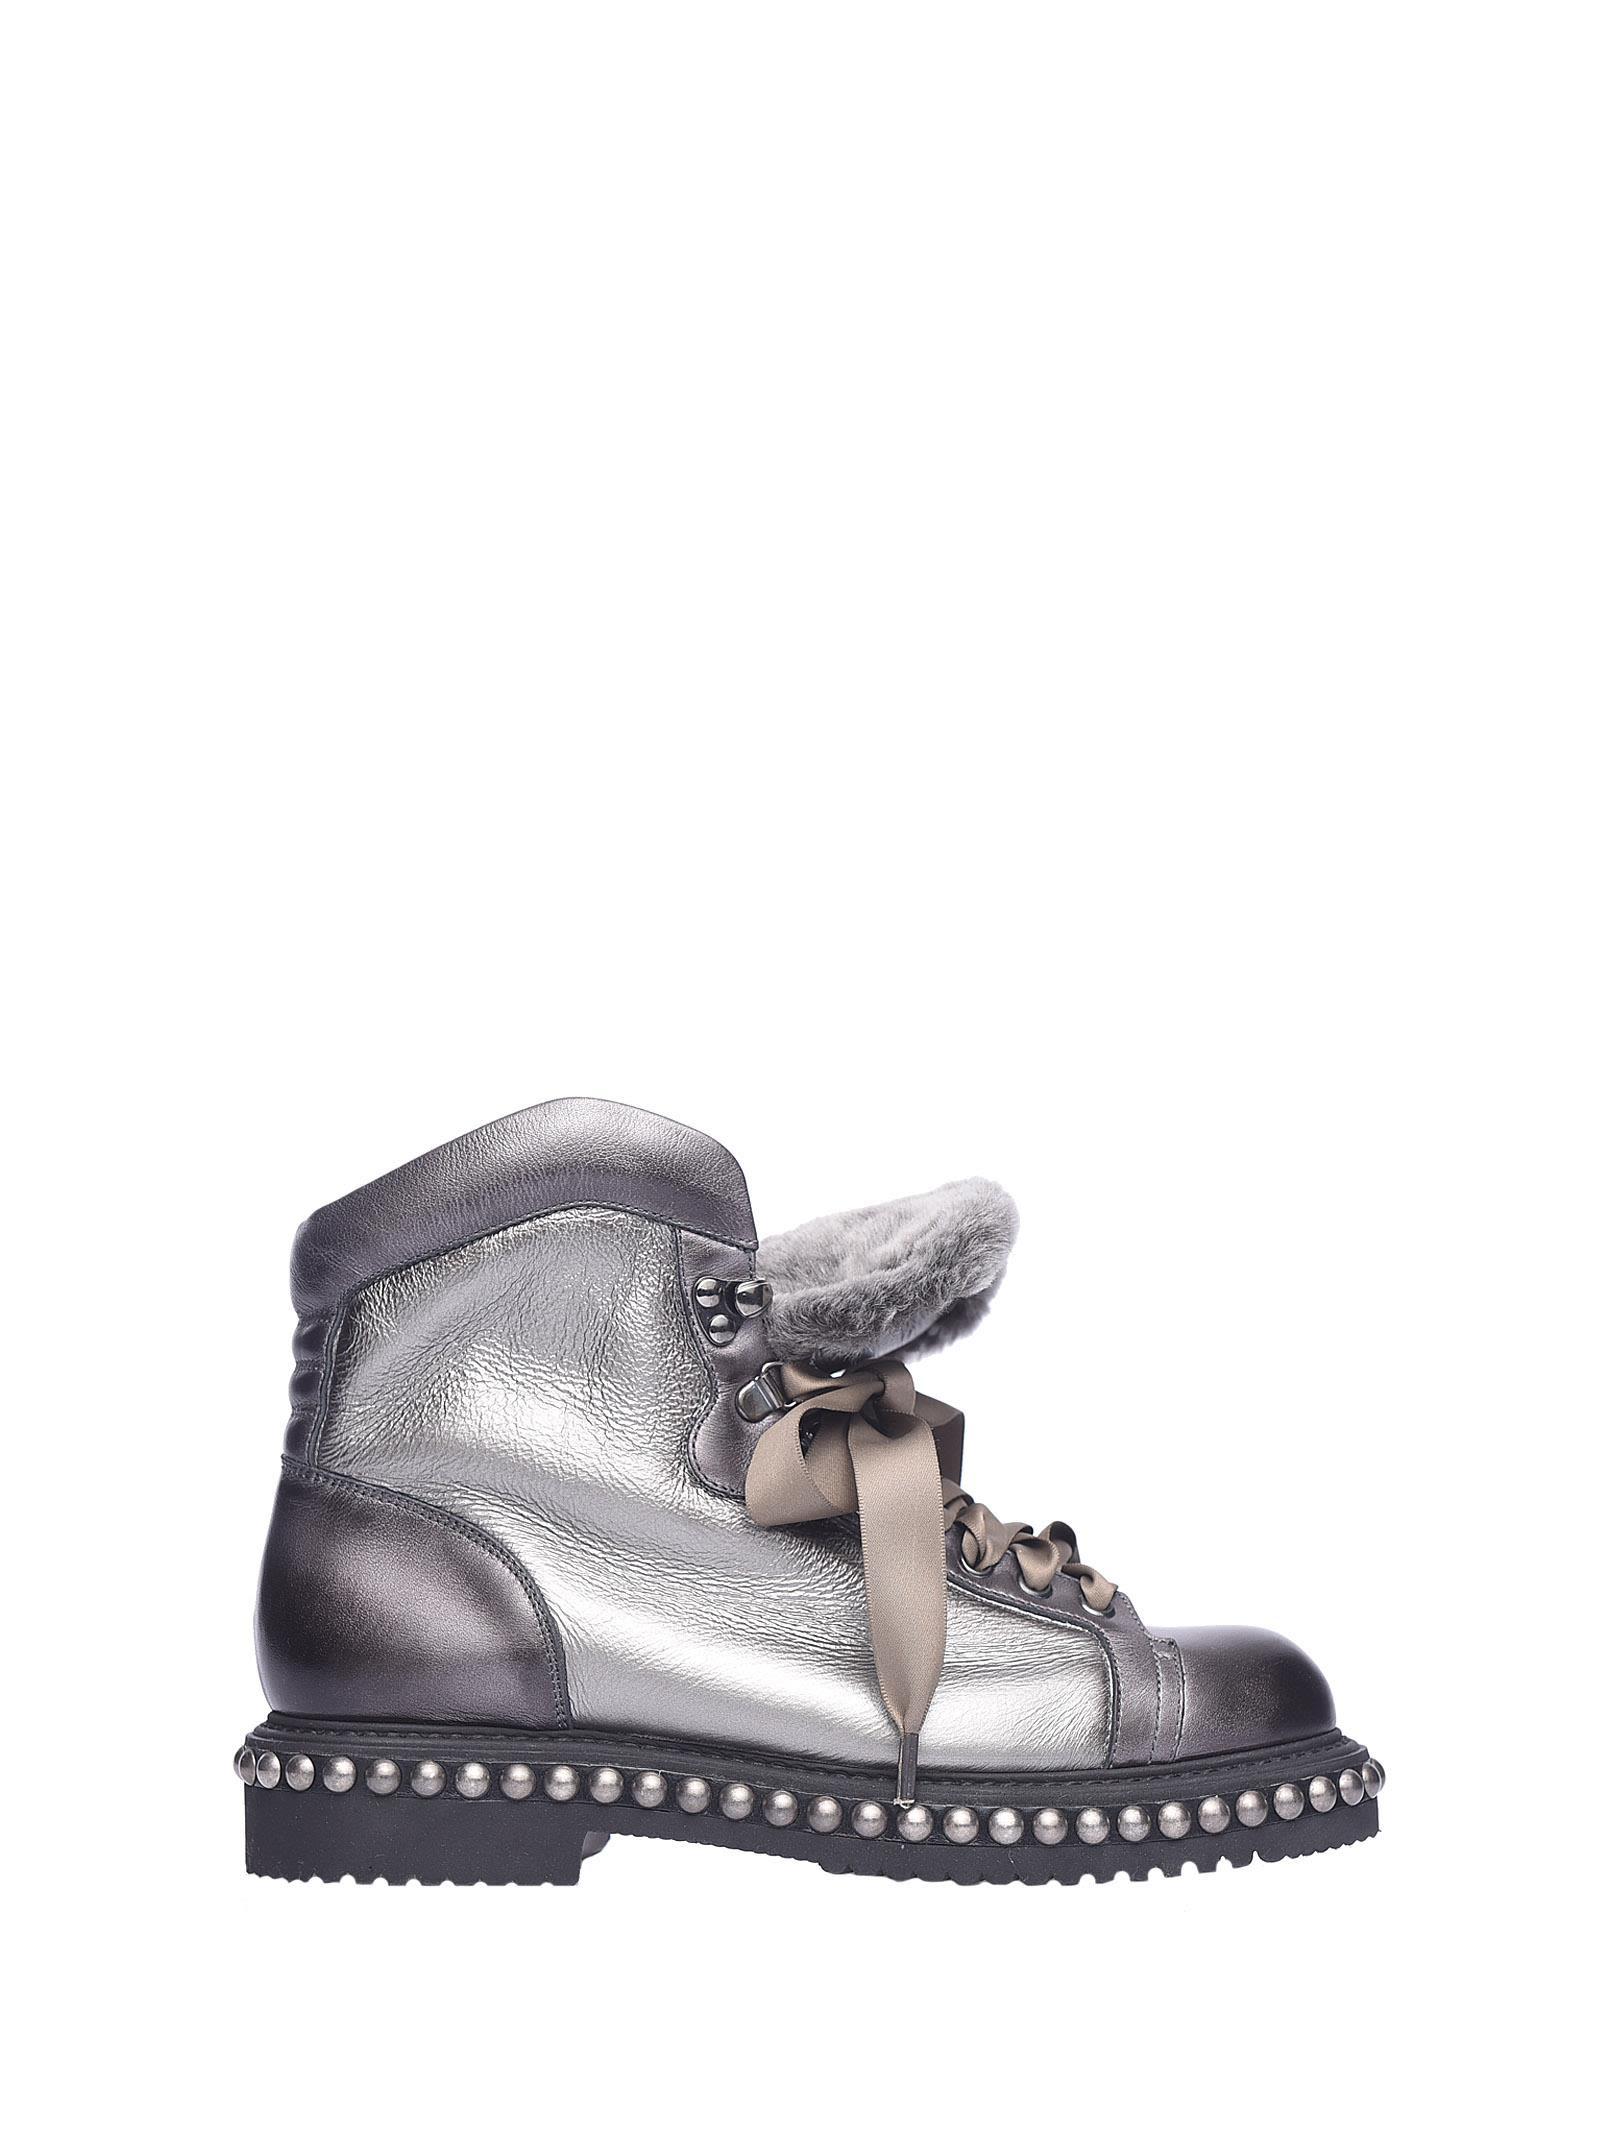 Santoni Metal Demi-boot Silver